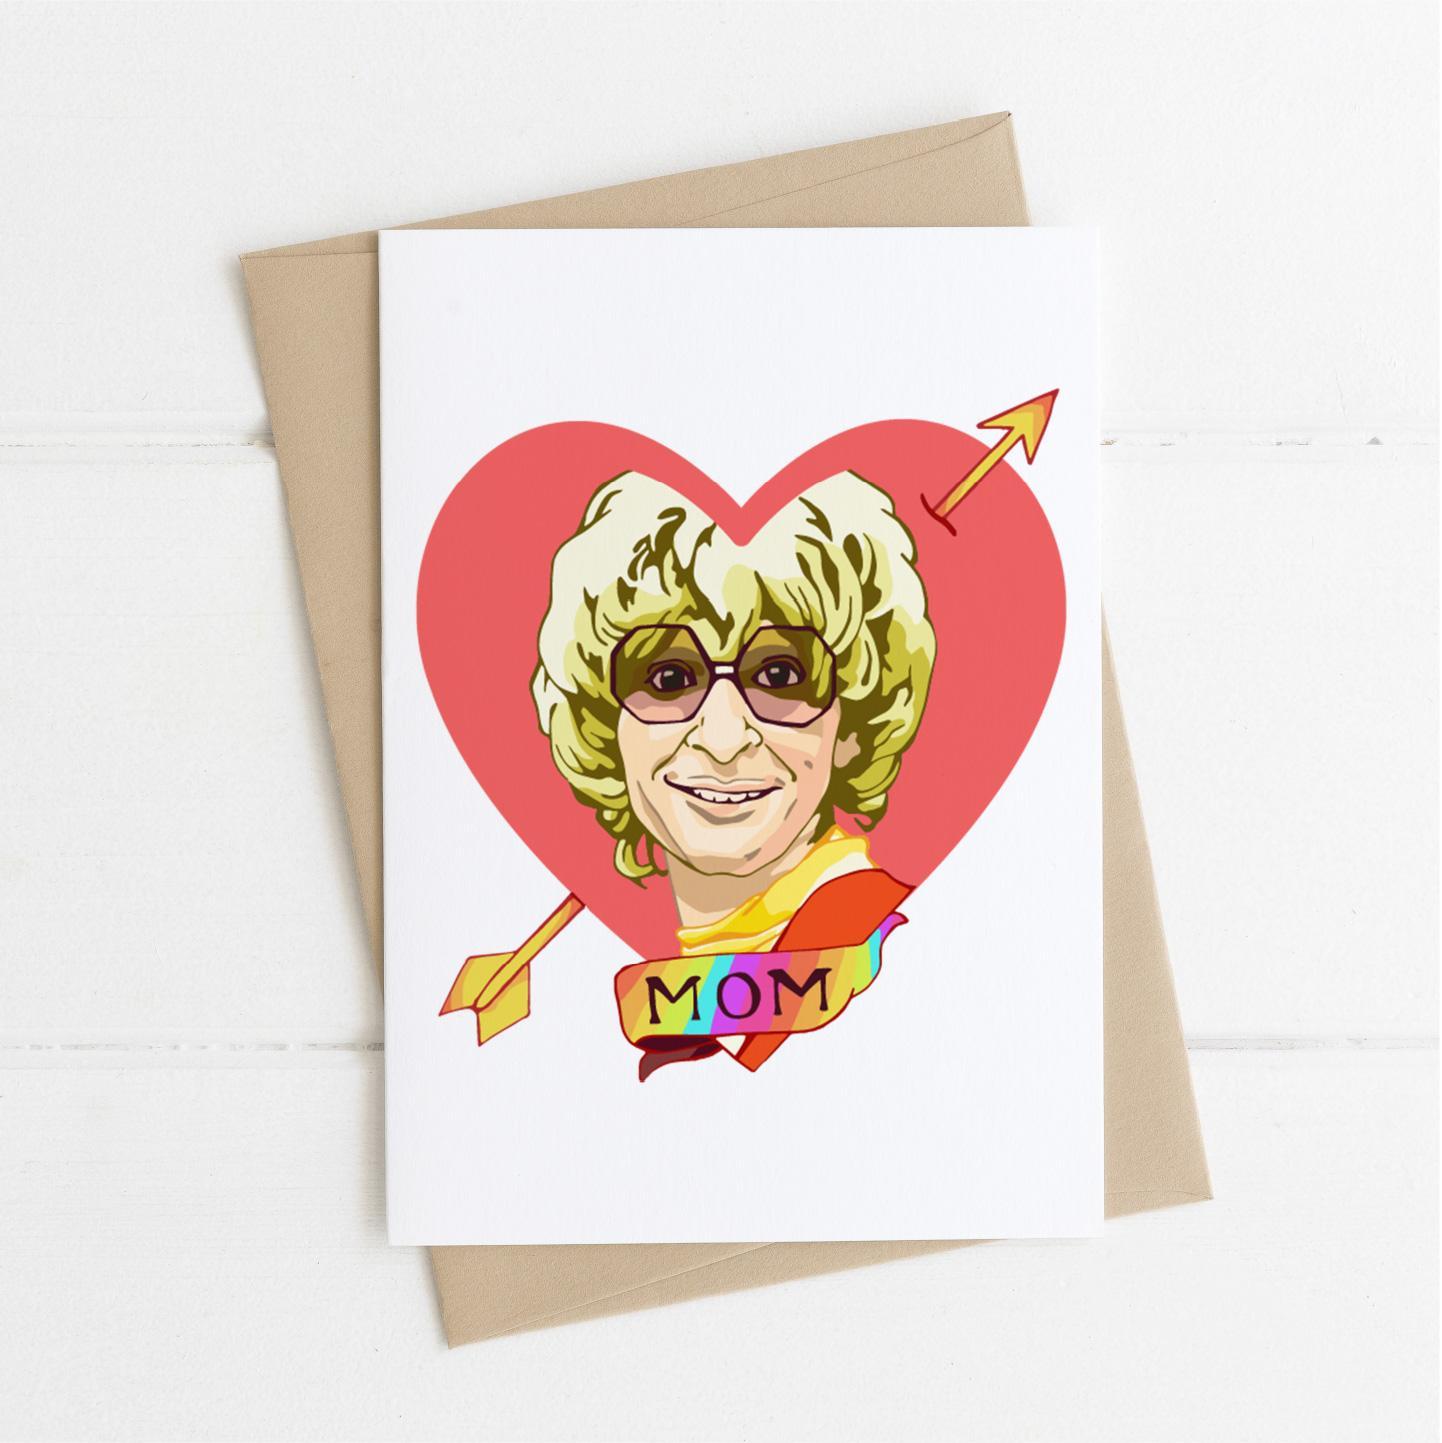 Sylvia Rivera A7 card